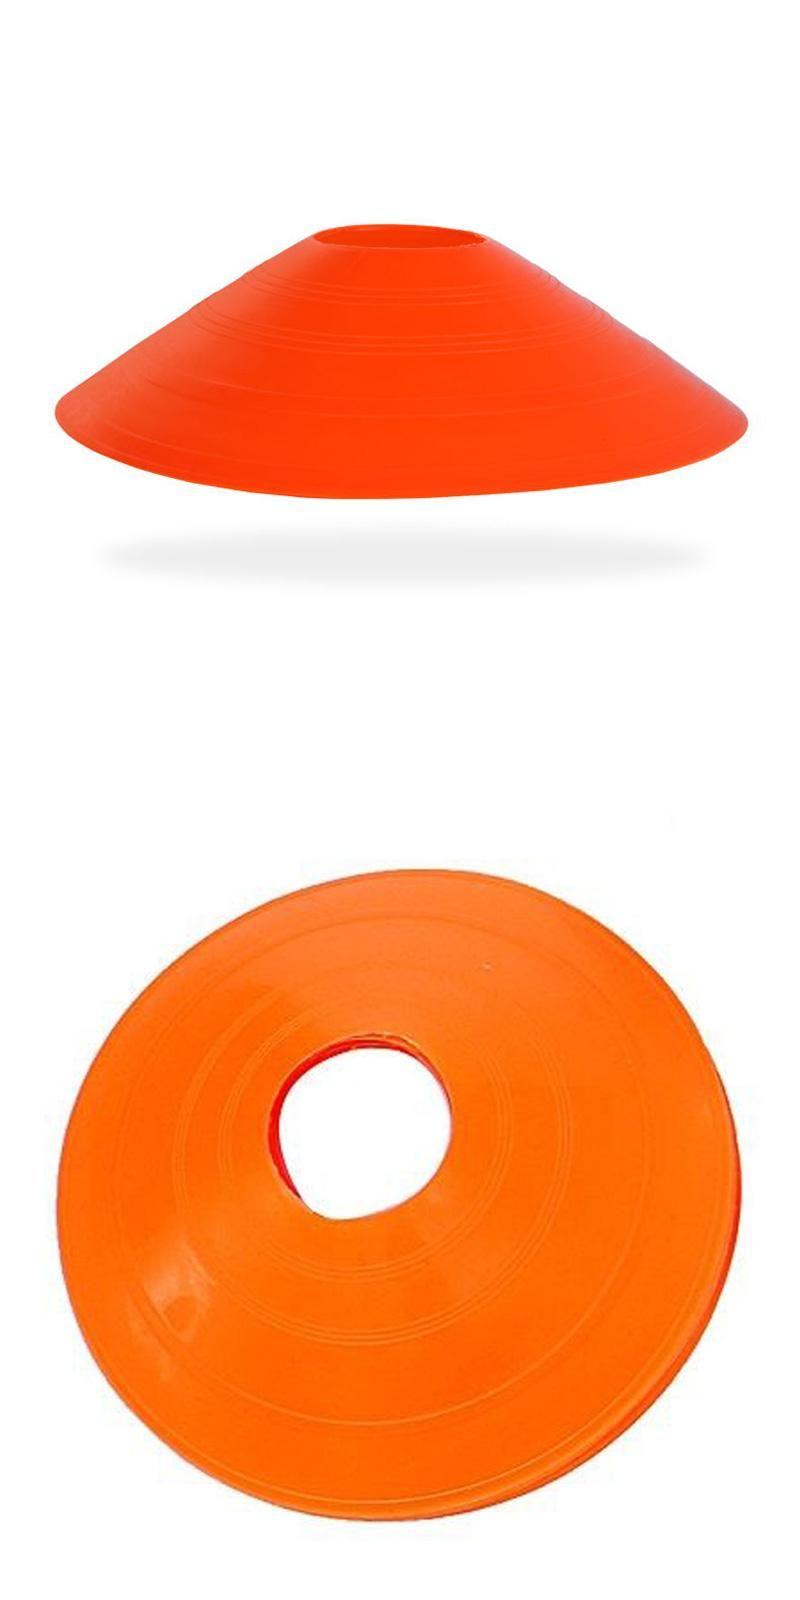 19cm Hot Outdoor Marker Discs Sports Saucer Soccer Football Training Cones